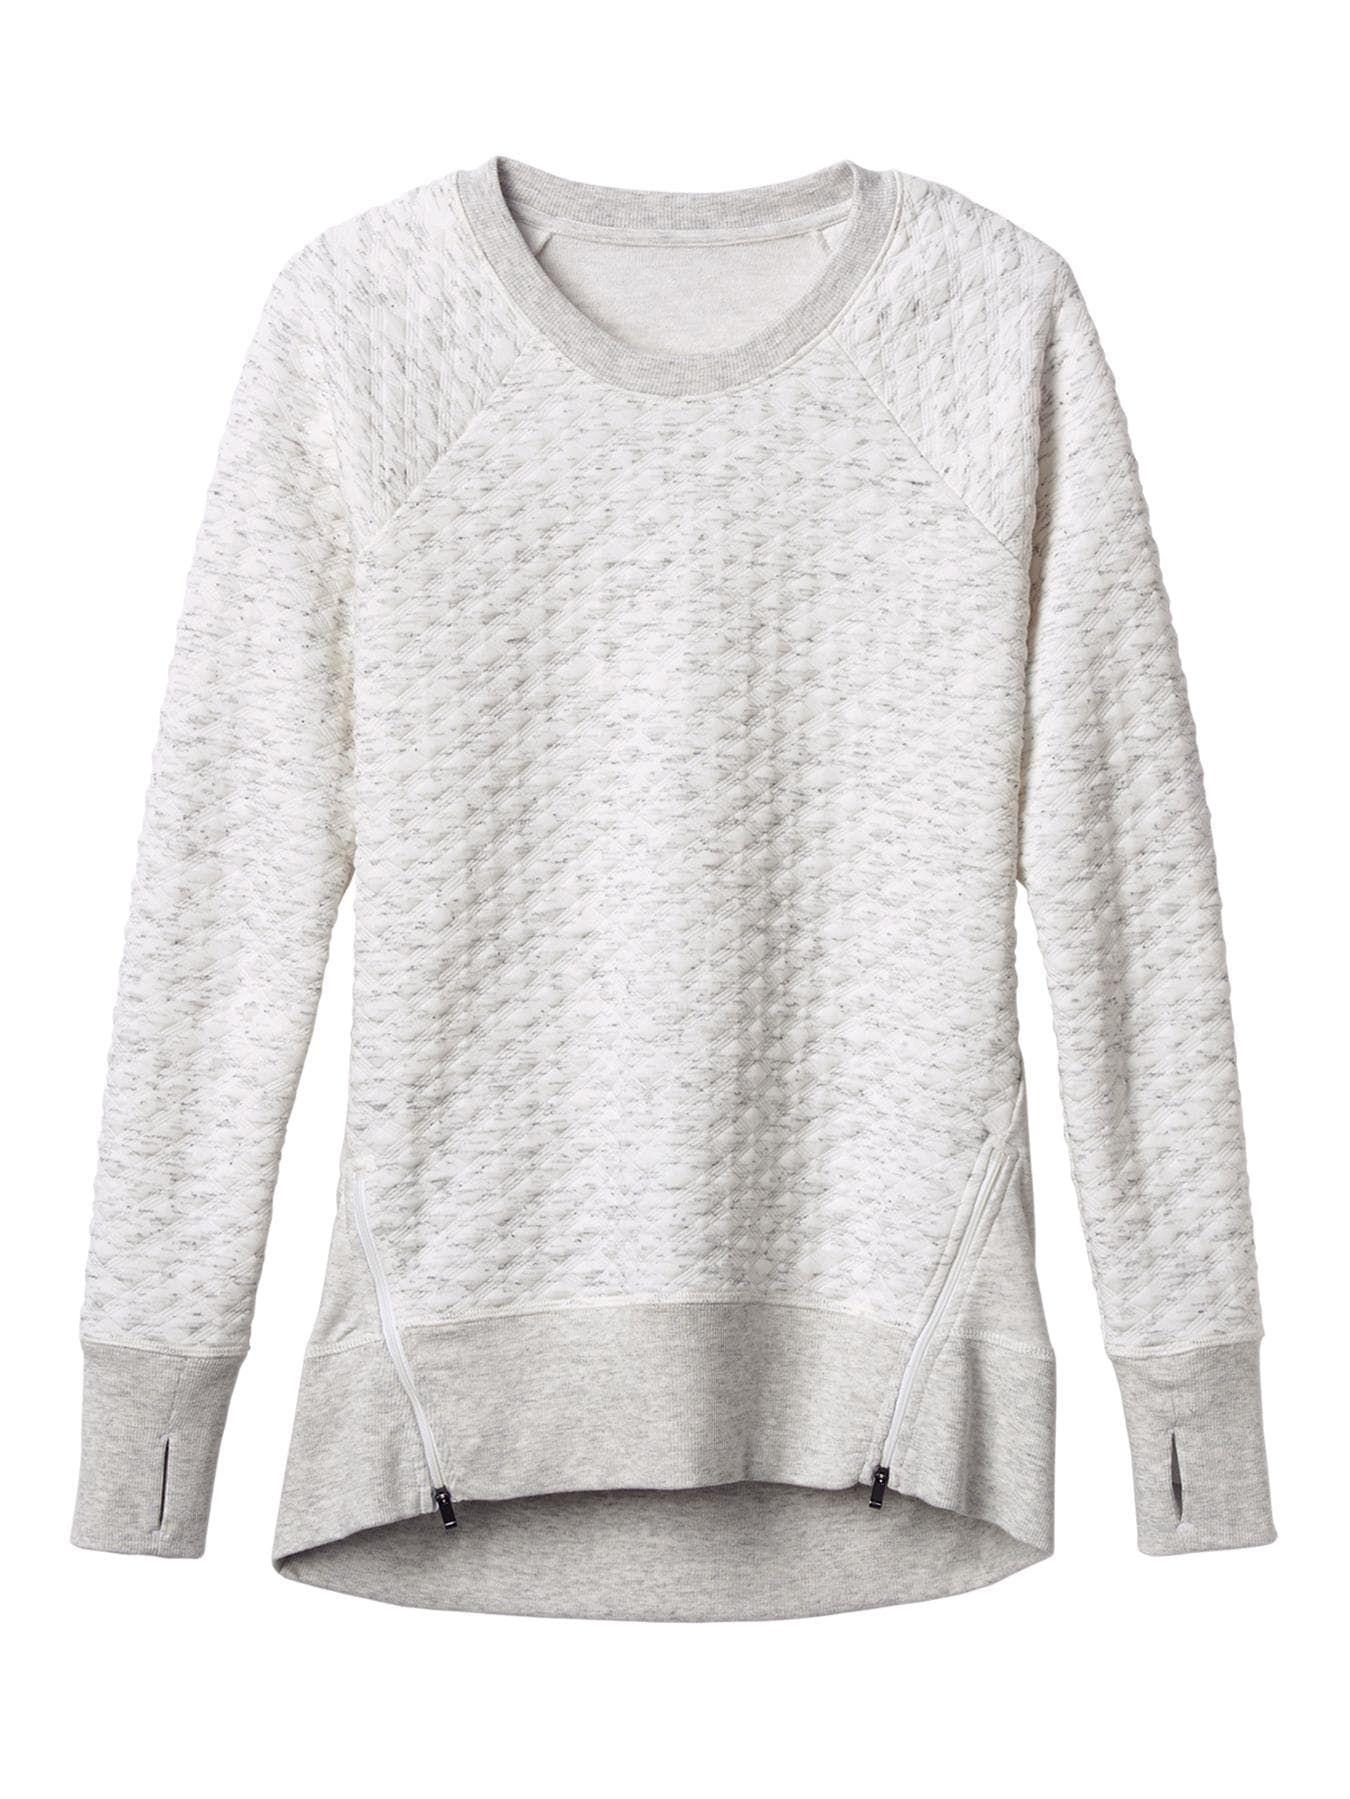 Athleta Quilted R R Sweatshirt 89 Clothes Sweatshirts Tops [ 1799 x 1350 Pixel ]